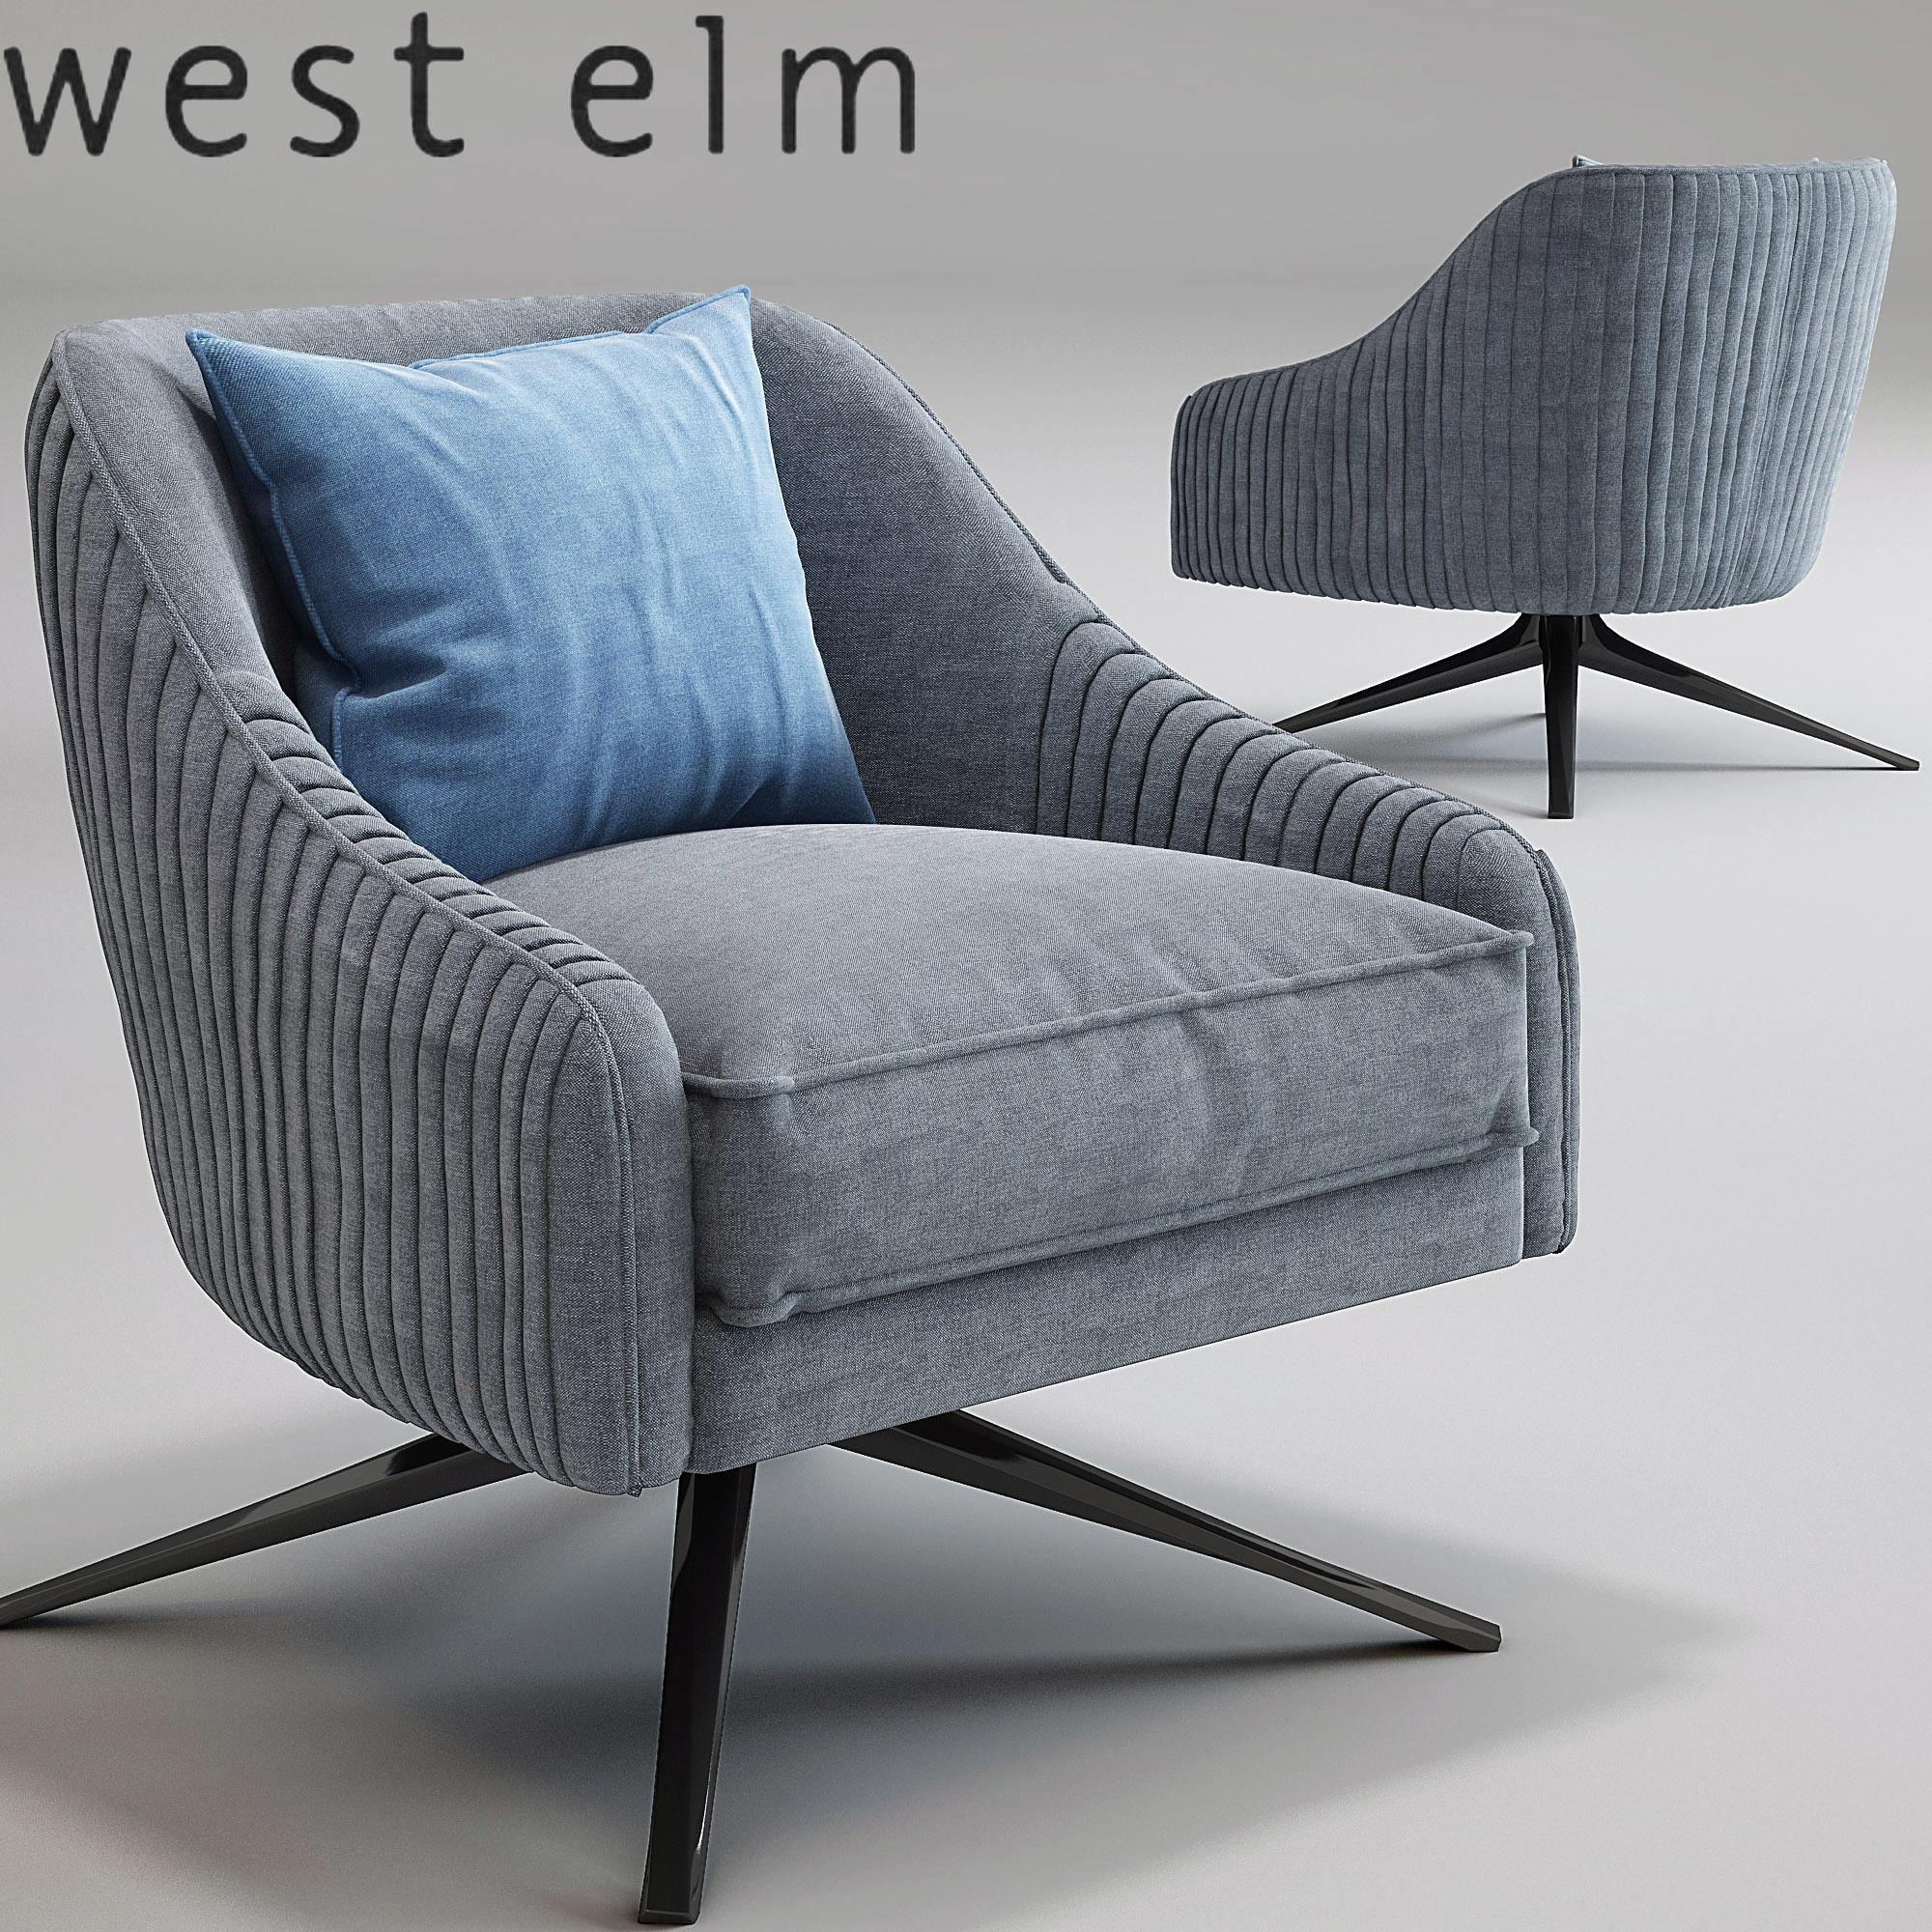 Roar Rabbit Swivel Chair West Elm 3d Model Max Obj Mtl ...